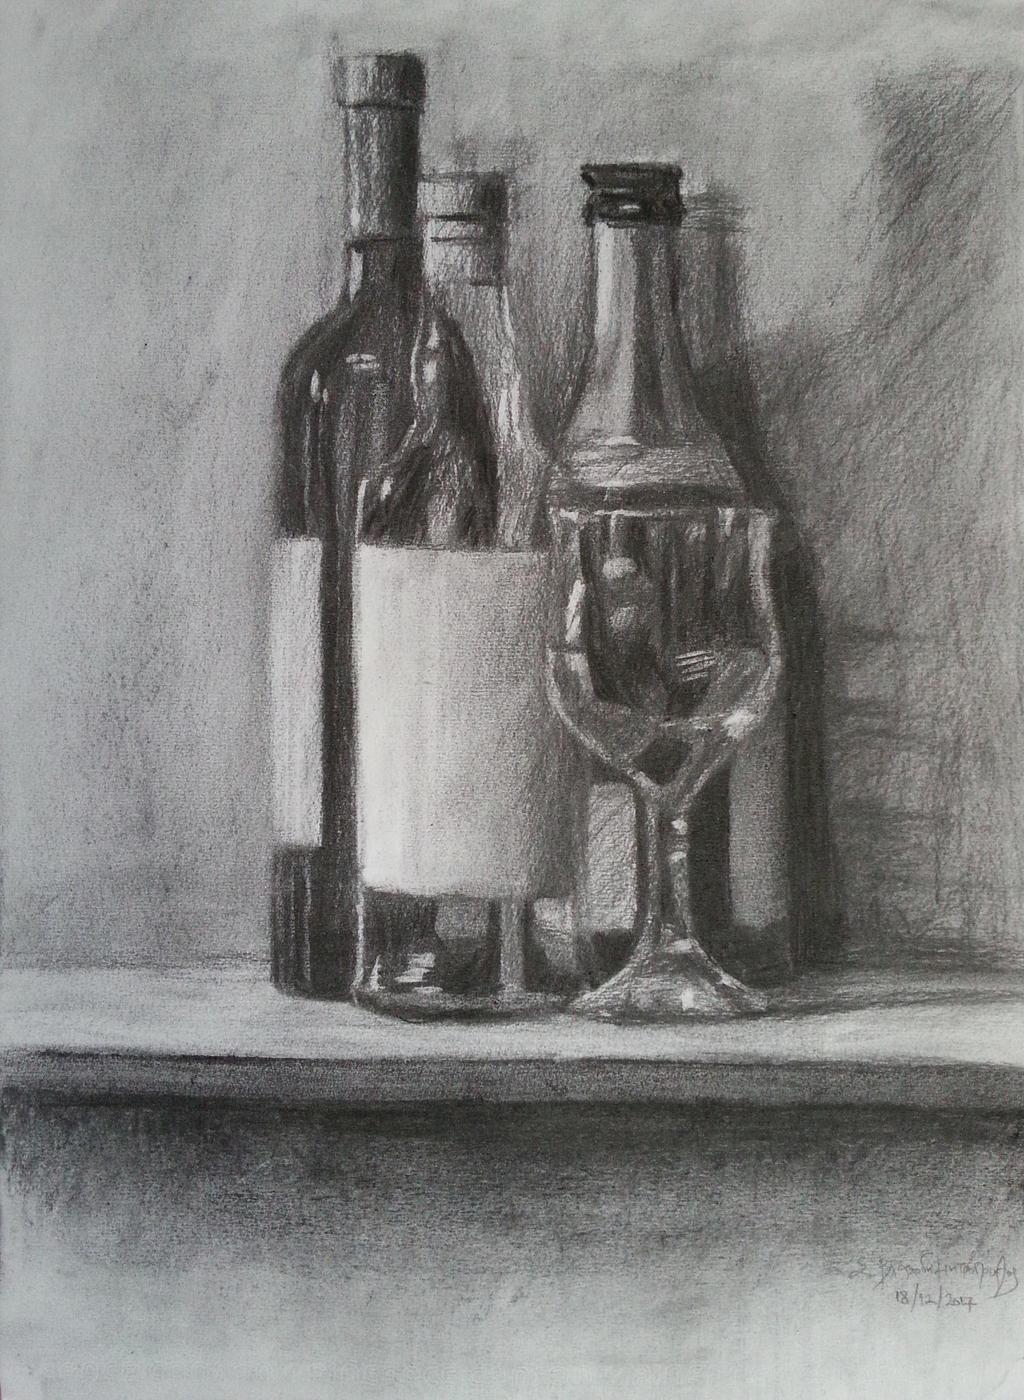 Still Life (Bottles and Glass)